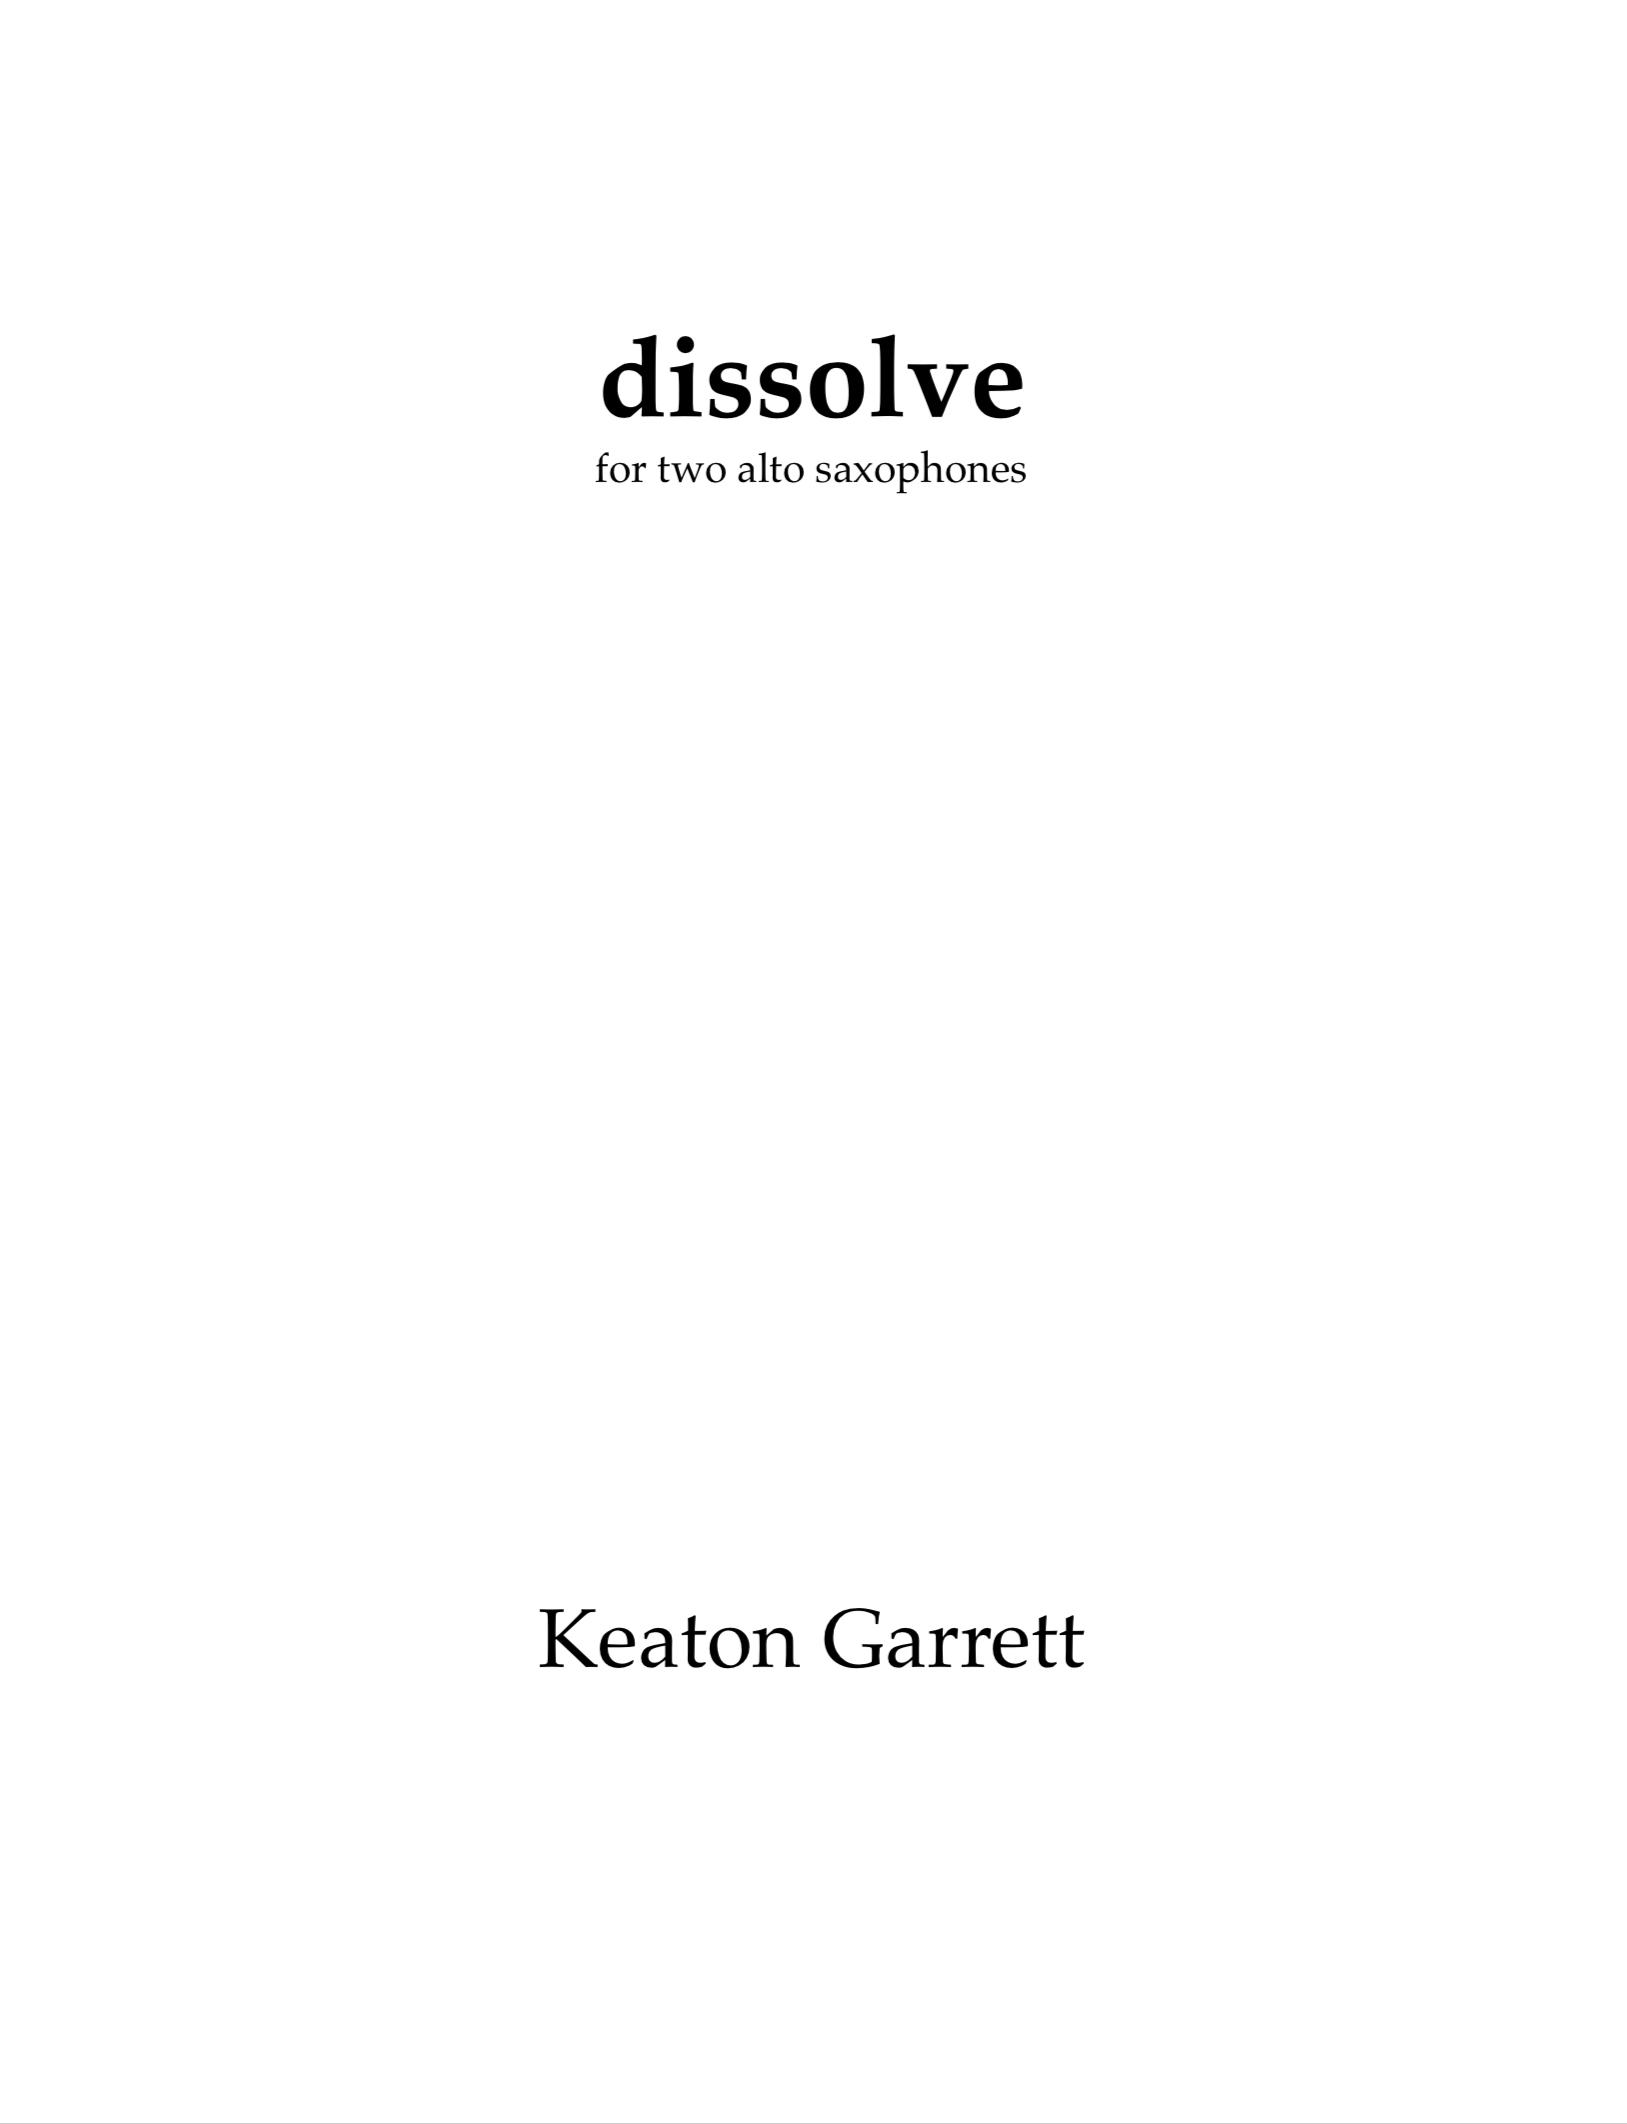 Dissolve  by Keaton Garrett